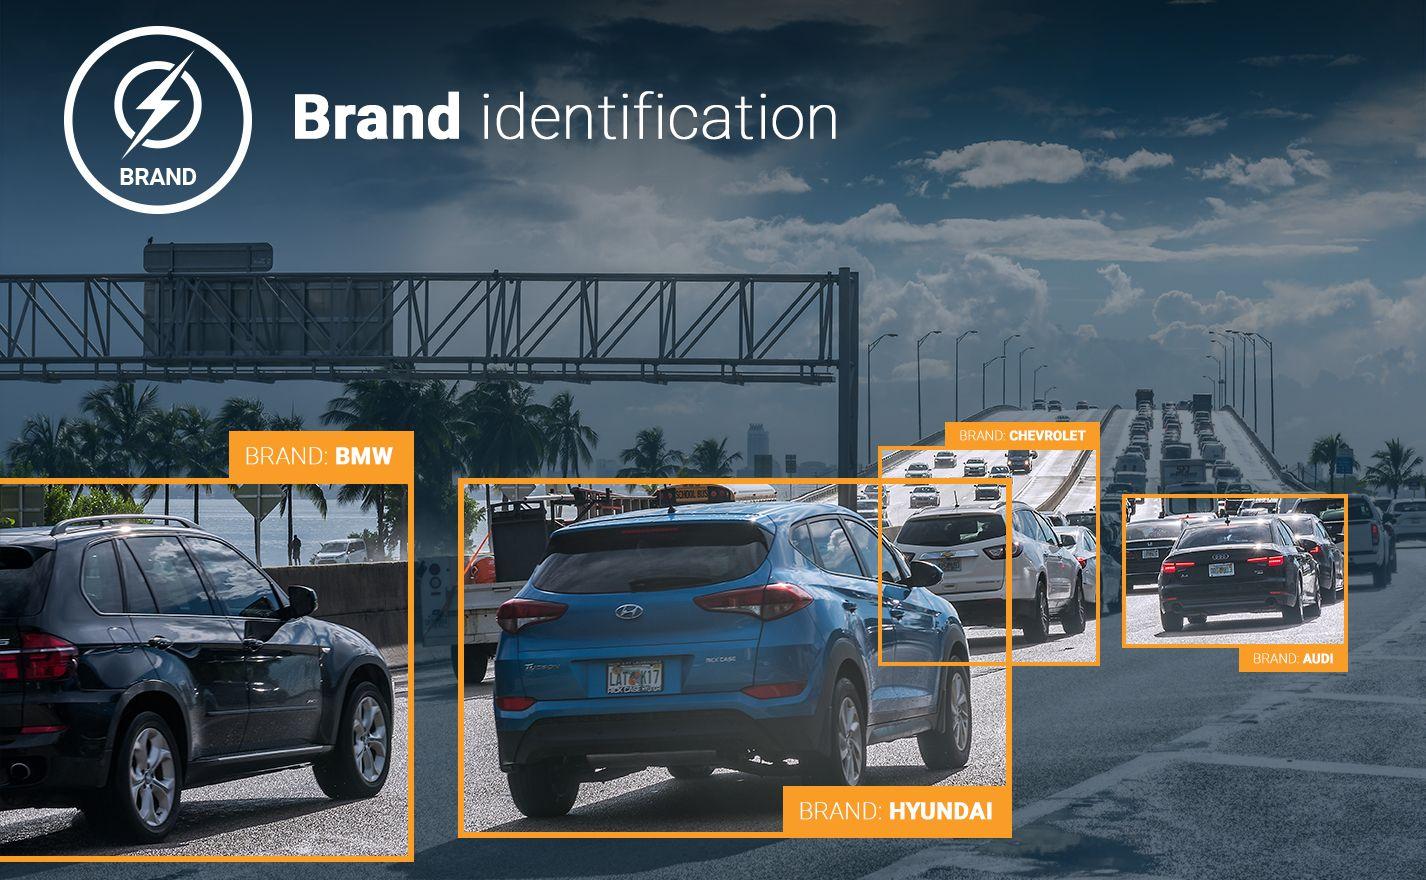 Brand/make identification